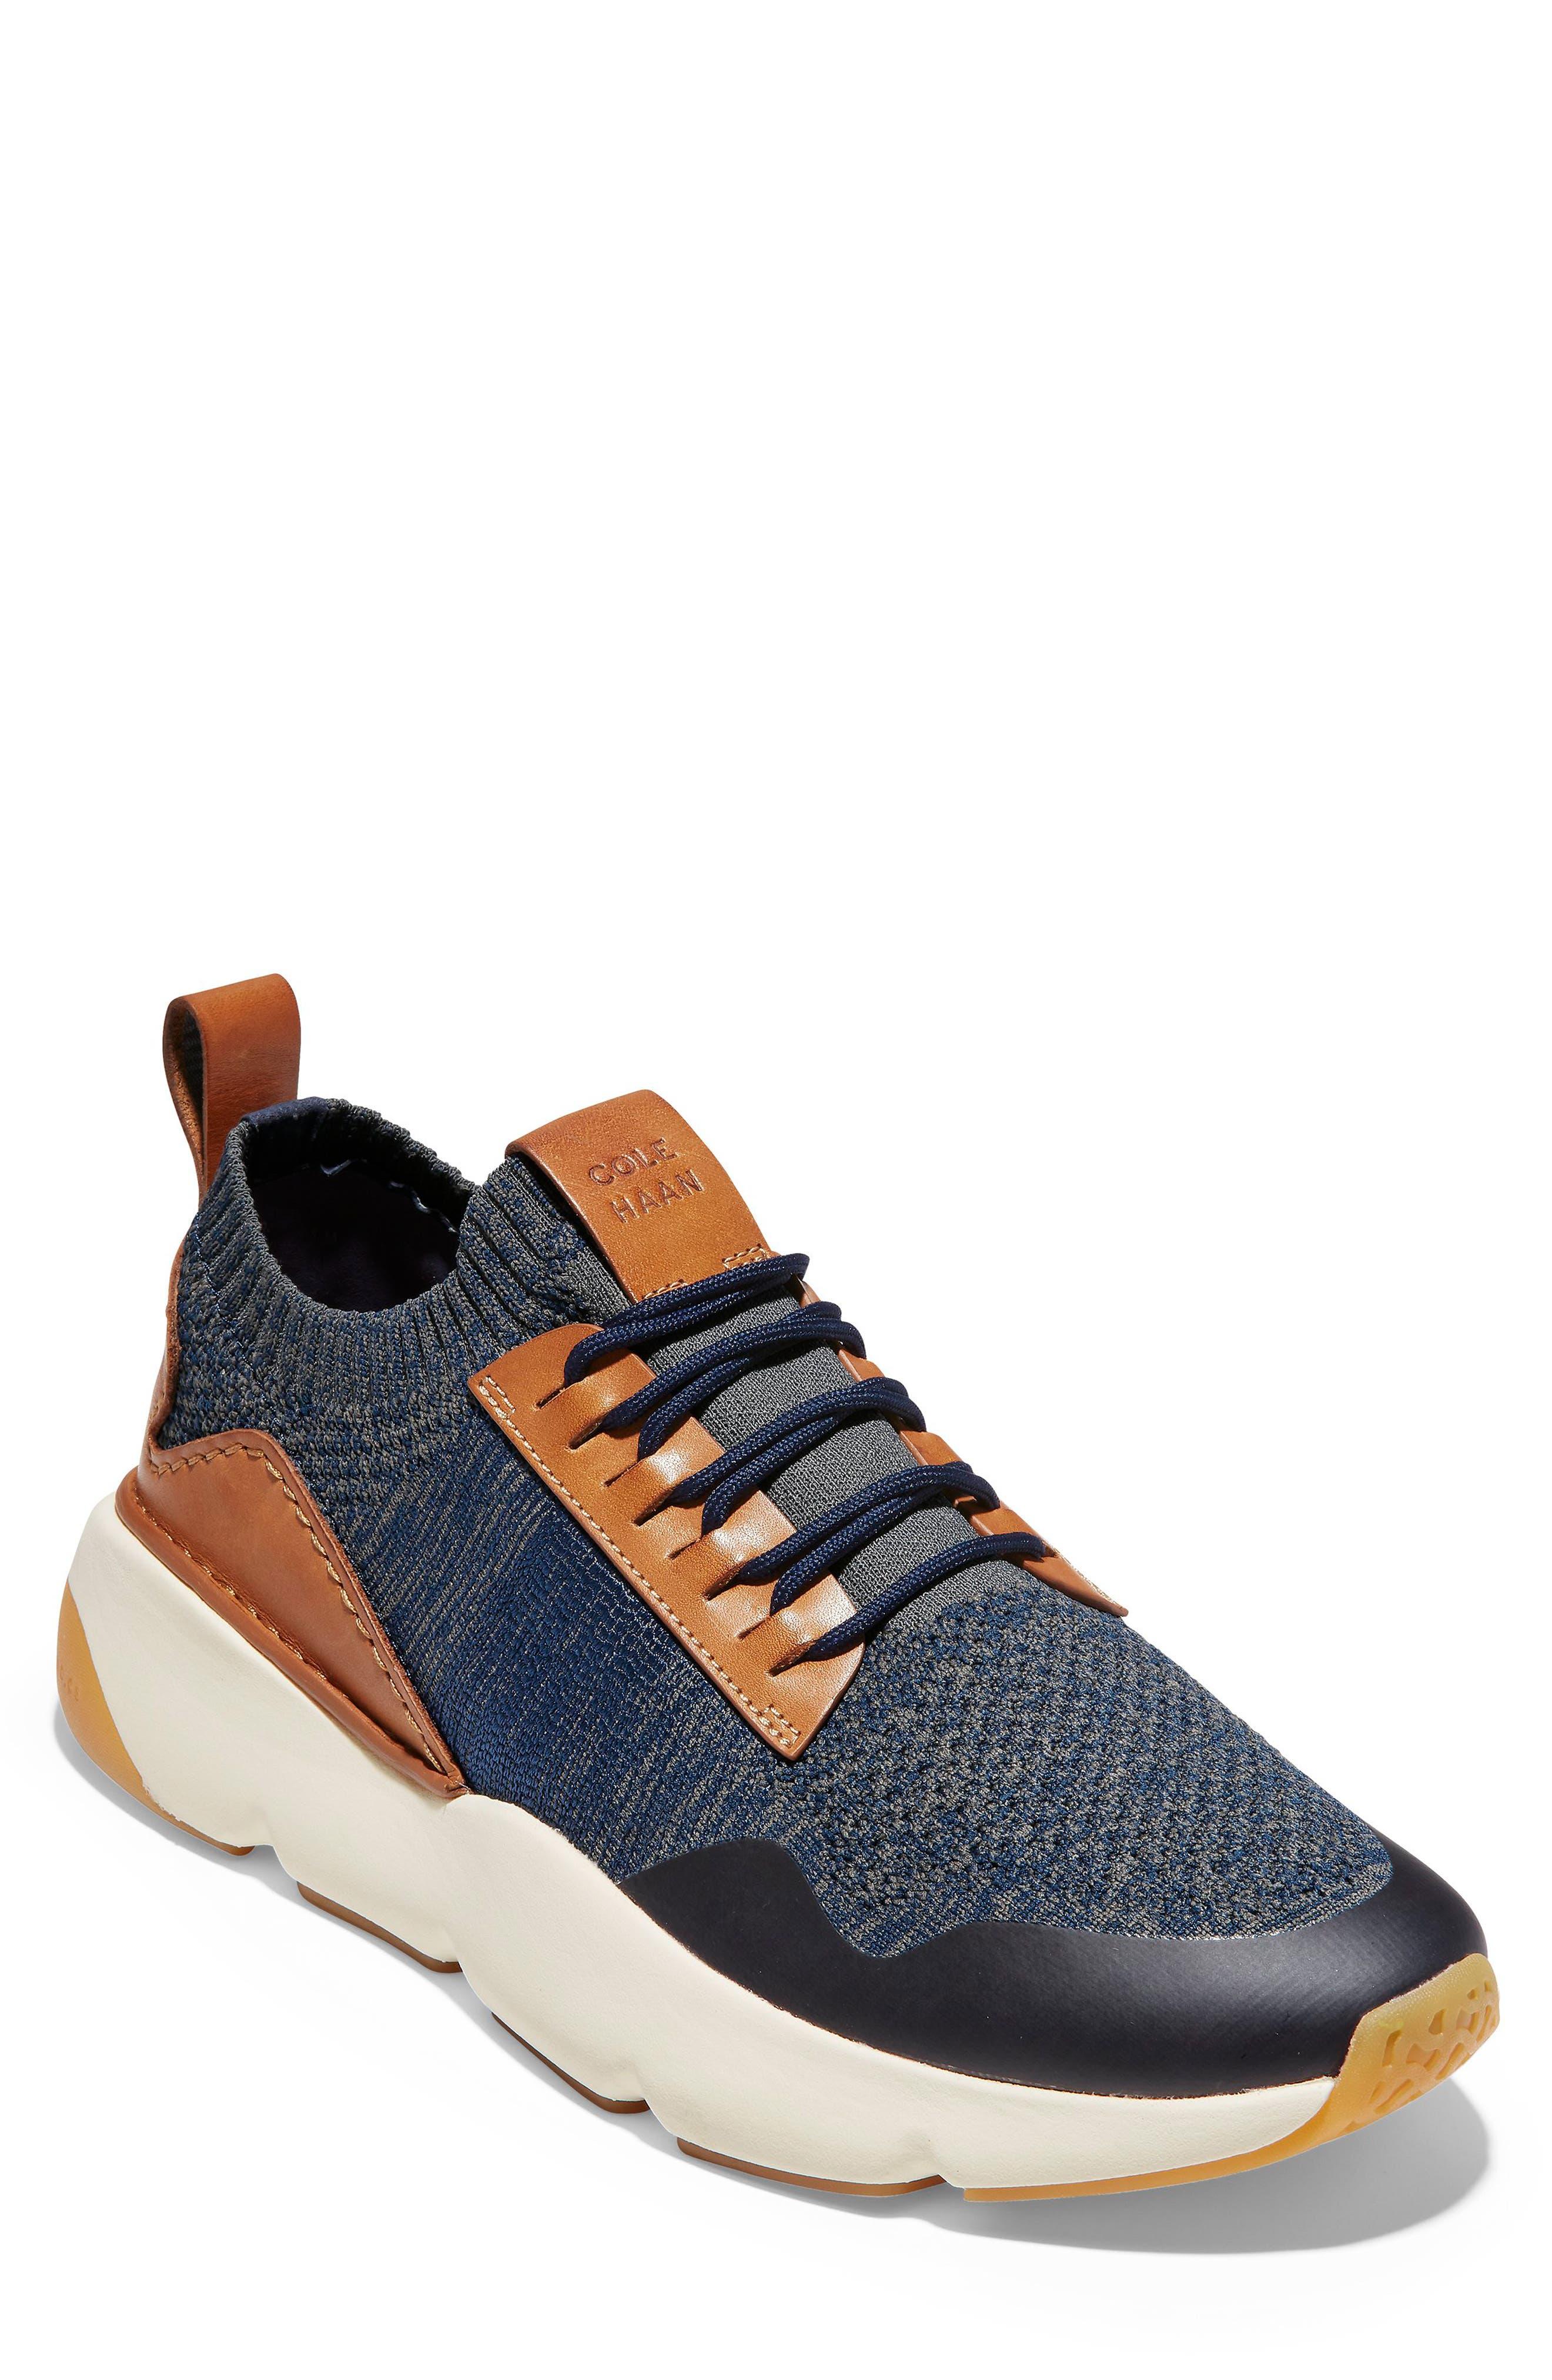 ZeroGrand All-Day Trainer Sneaker, Main, color, MARINE BLUE/ TAN KNIT